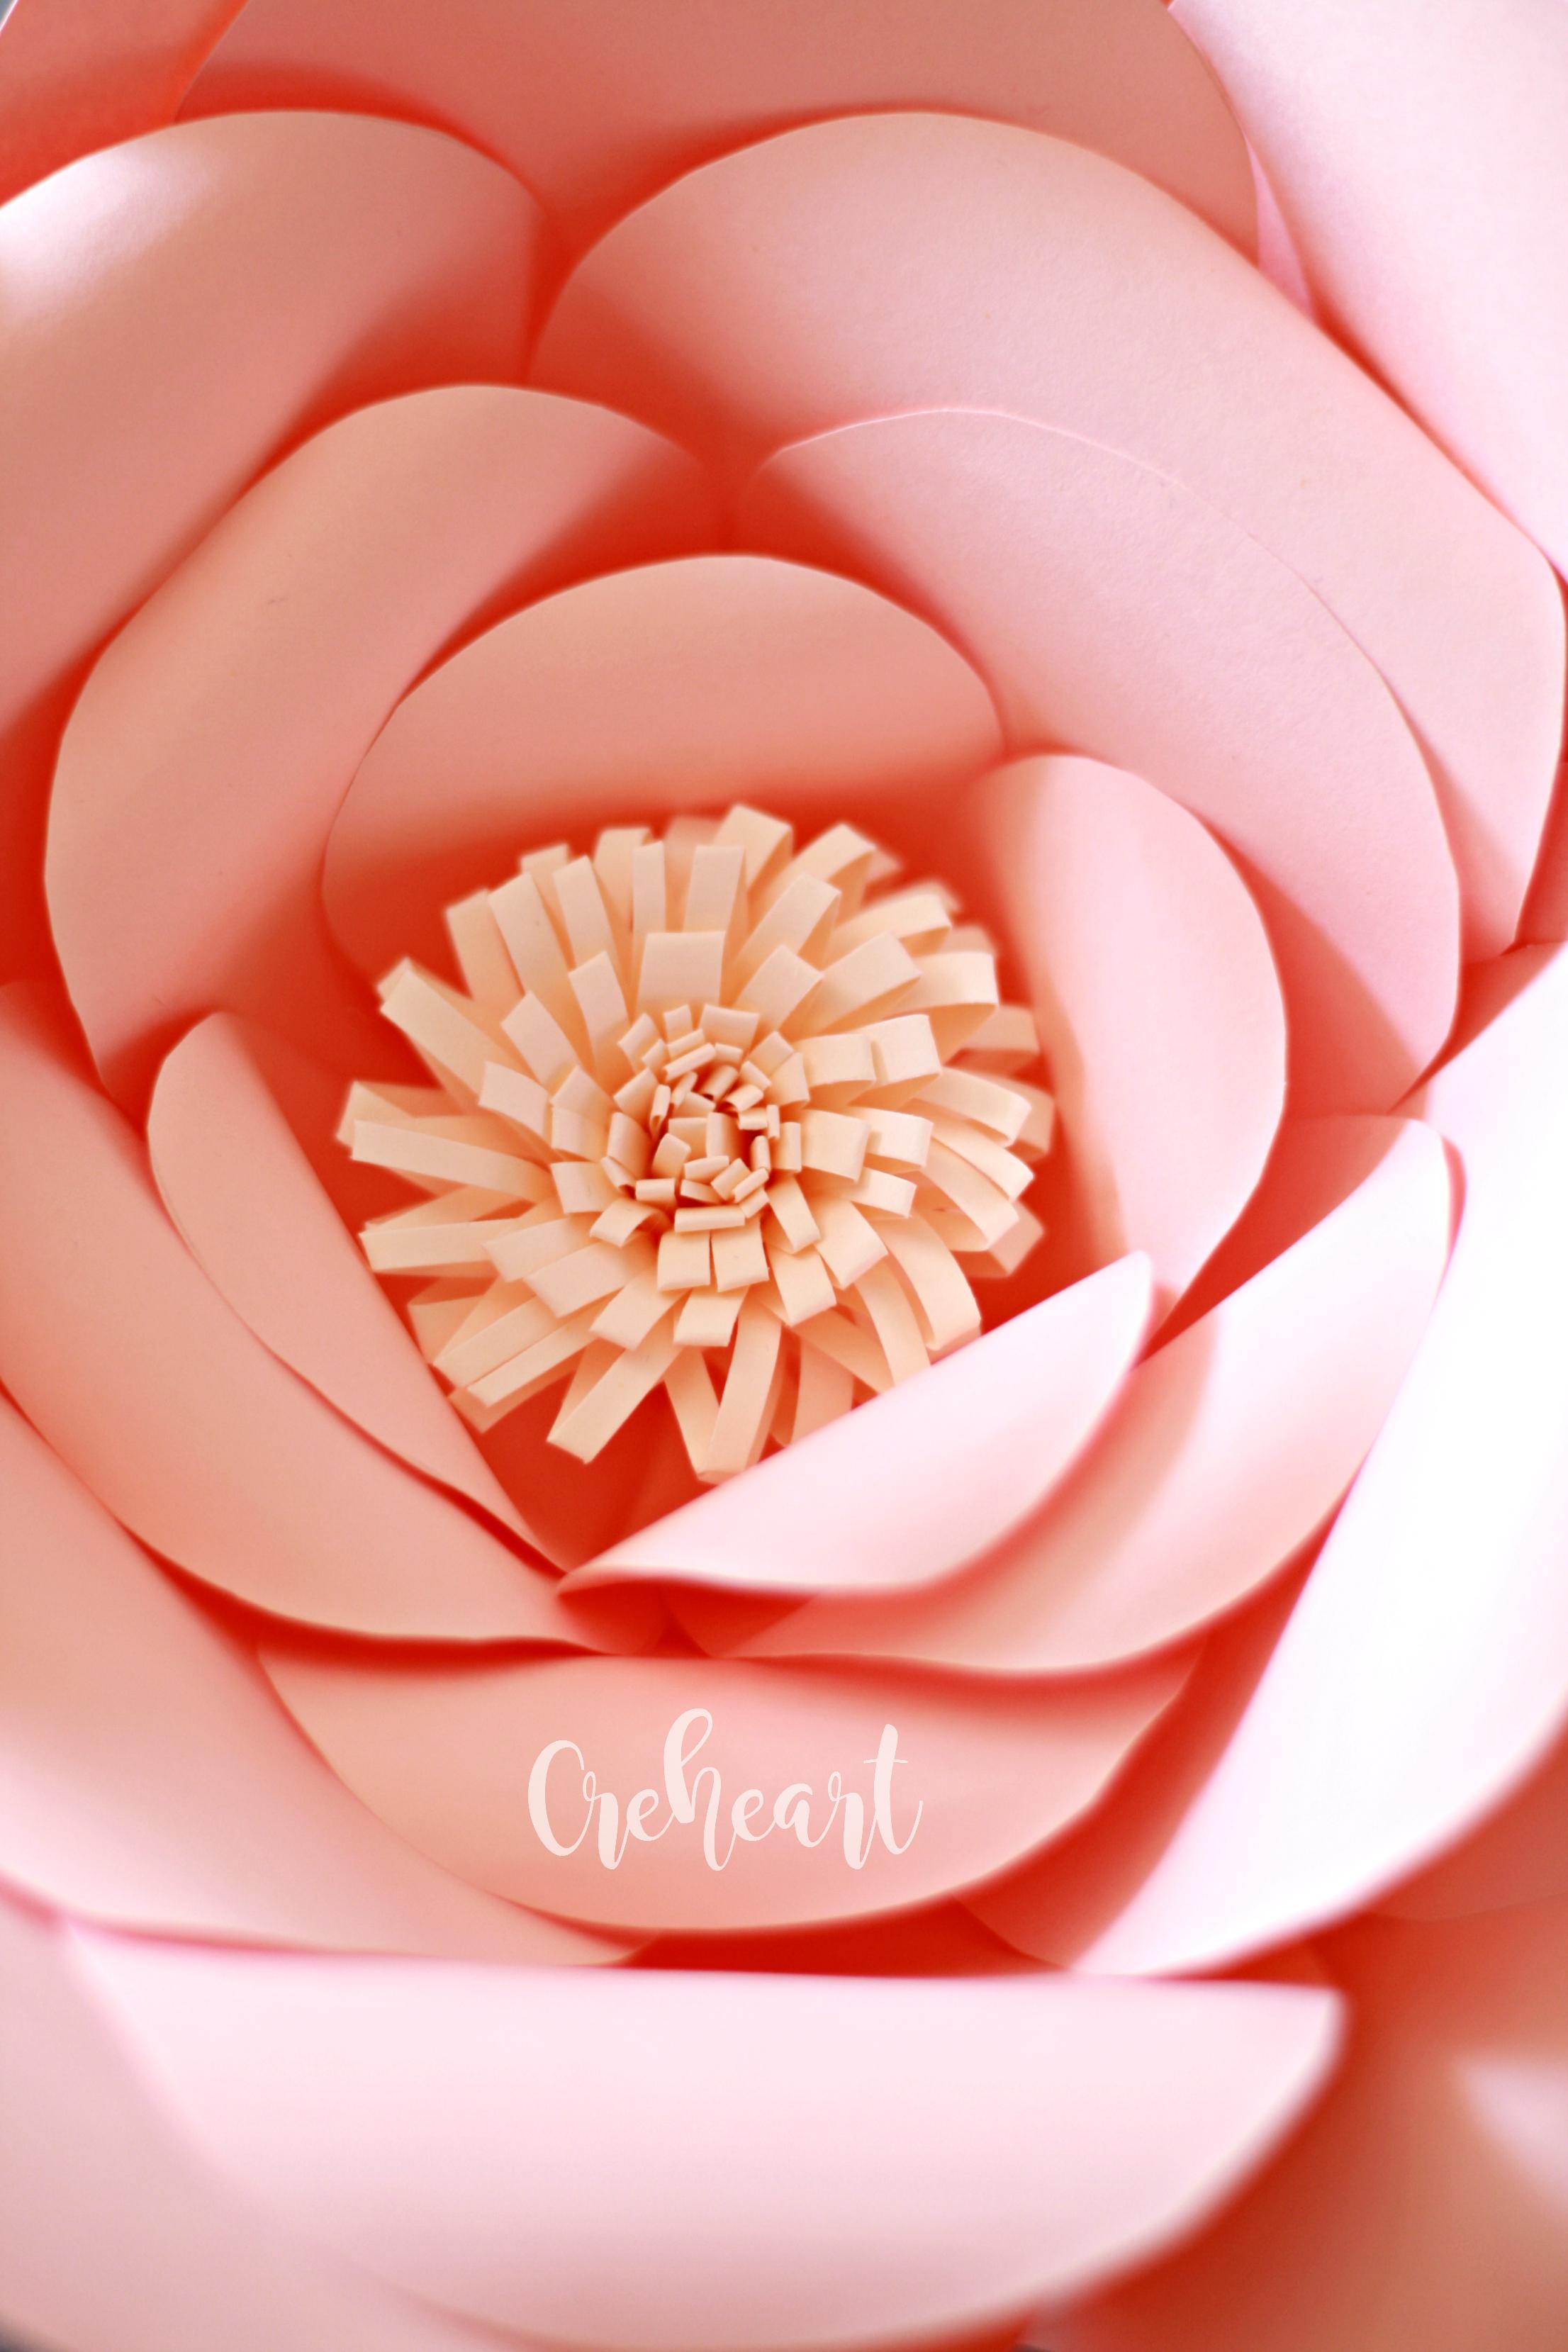 Flower Pink Creheart.jpg